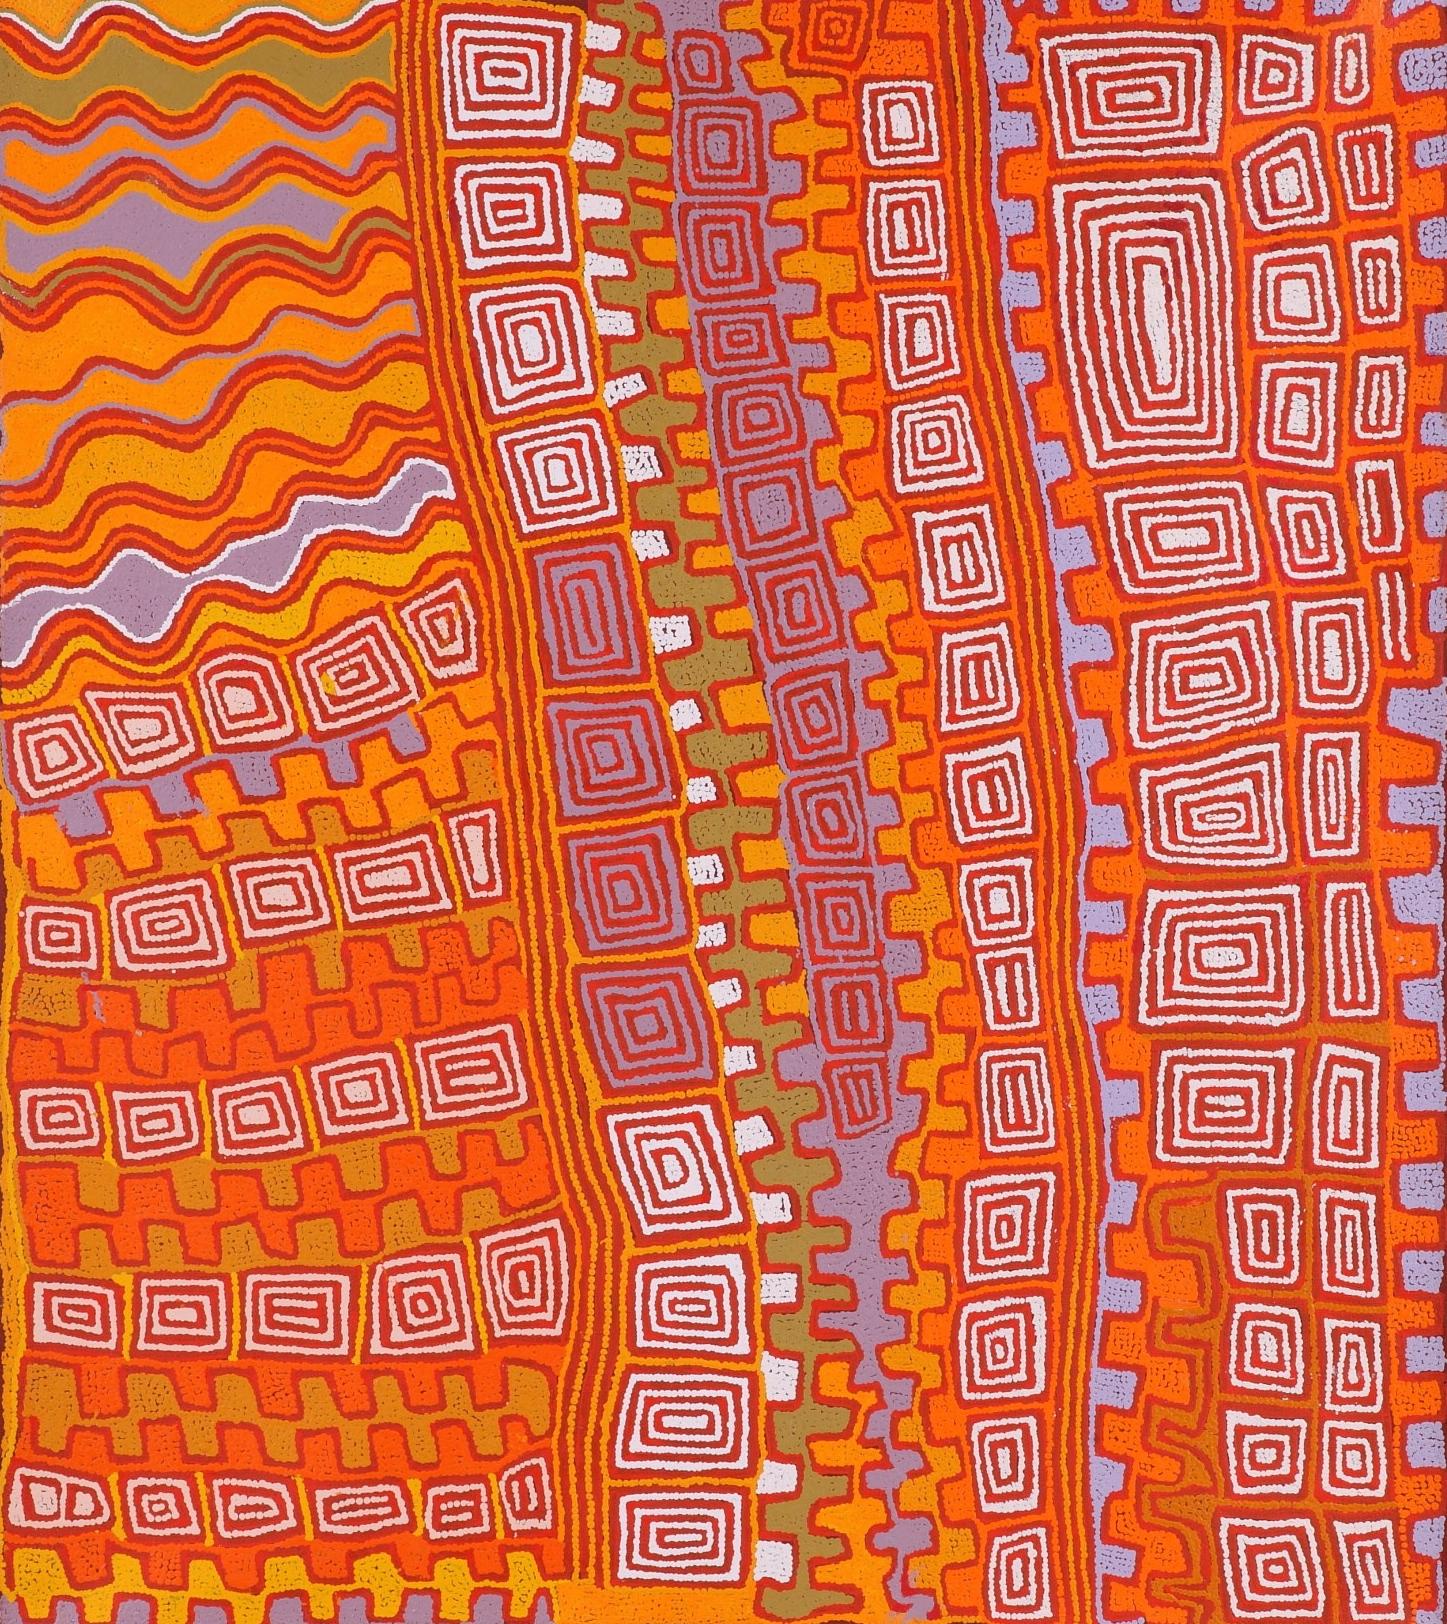 "Patrick Tjungurrayi  Kampurarrpa Dreaming at Kura, 2012  48 x 42"" (122 x 107cm) Acrylic on Belgian linen Papunya Tula Artists Catalog #PT1007091   EMAIL INQUIRY"